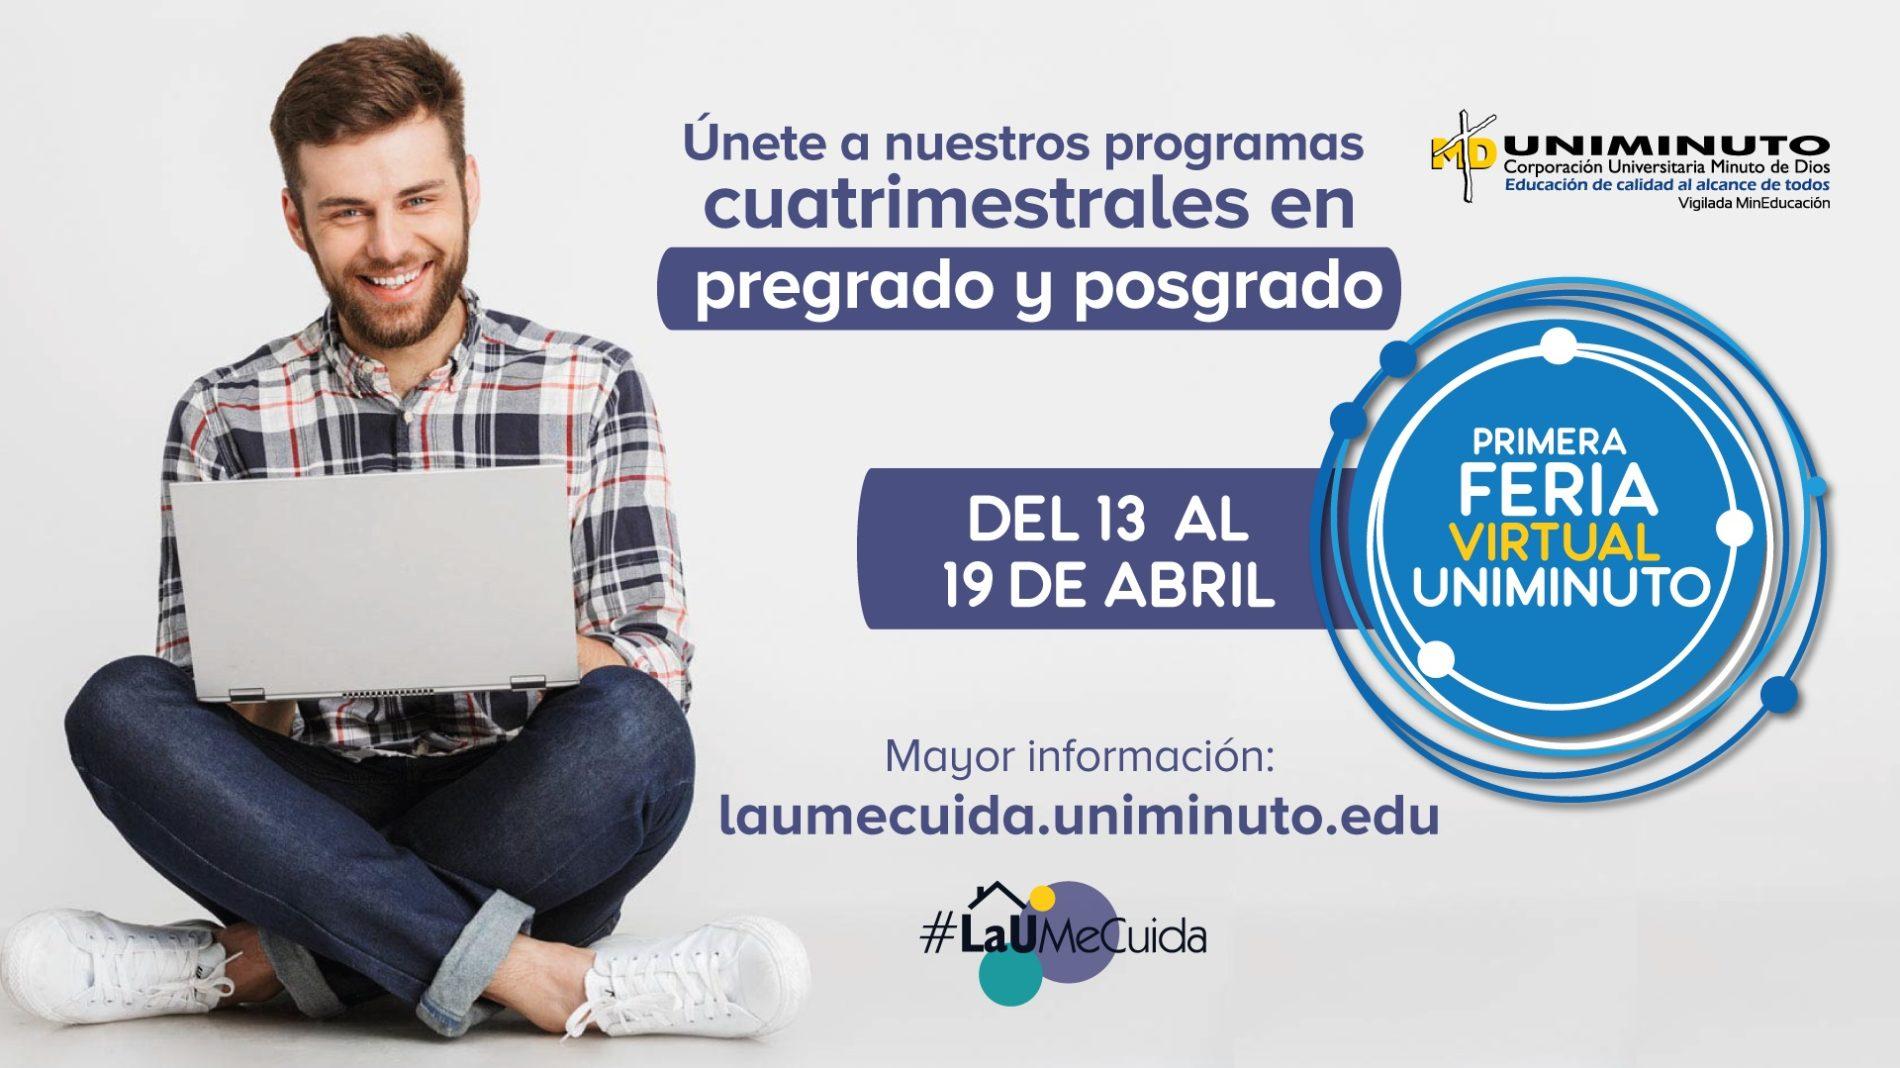 UNIMINUTO realiza su primera Feria Virtual Nacional